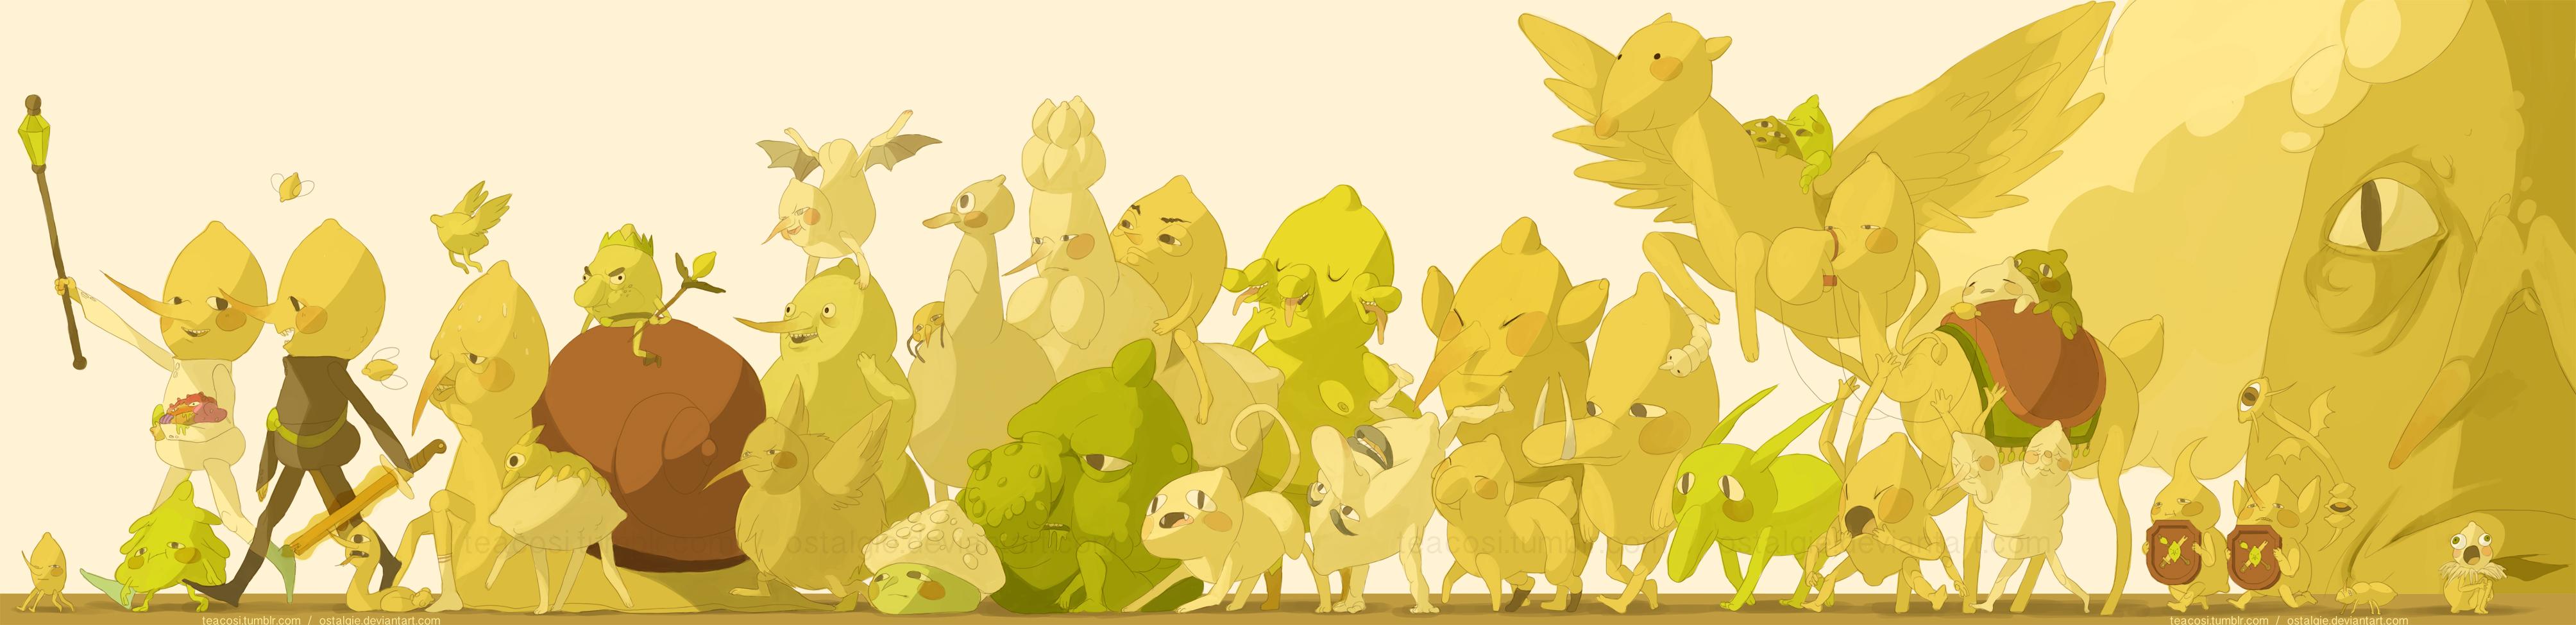 the big lemongrab family by teacosies